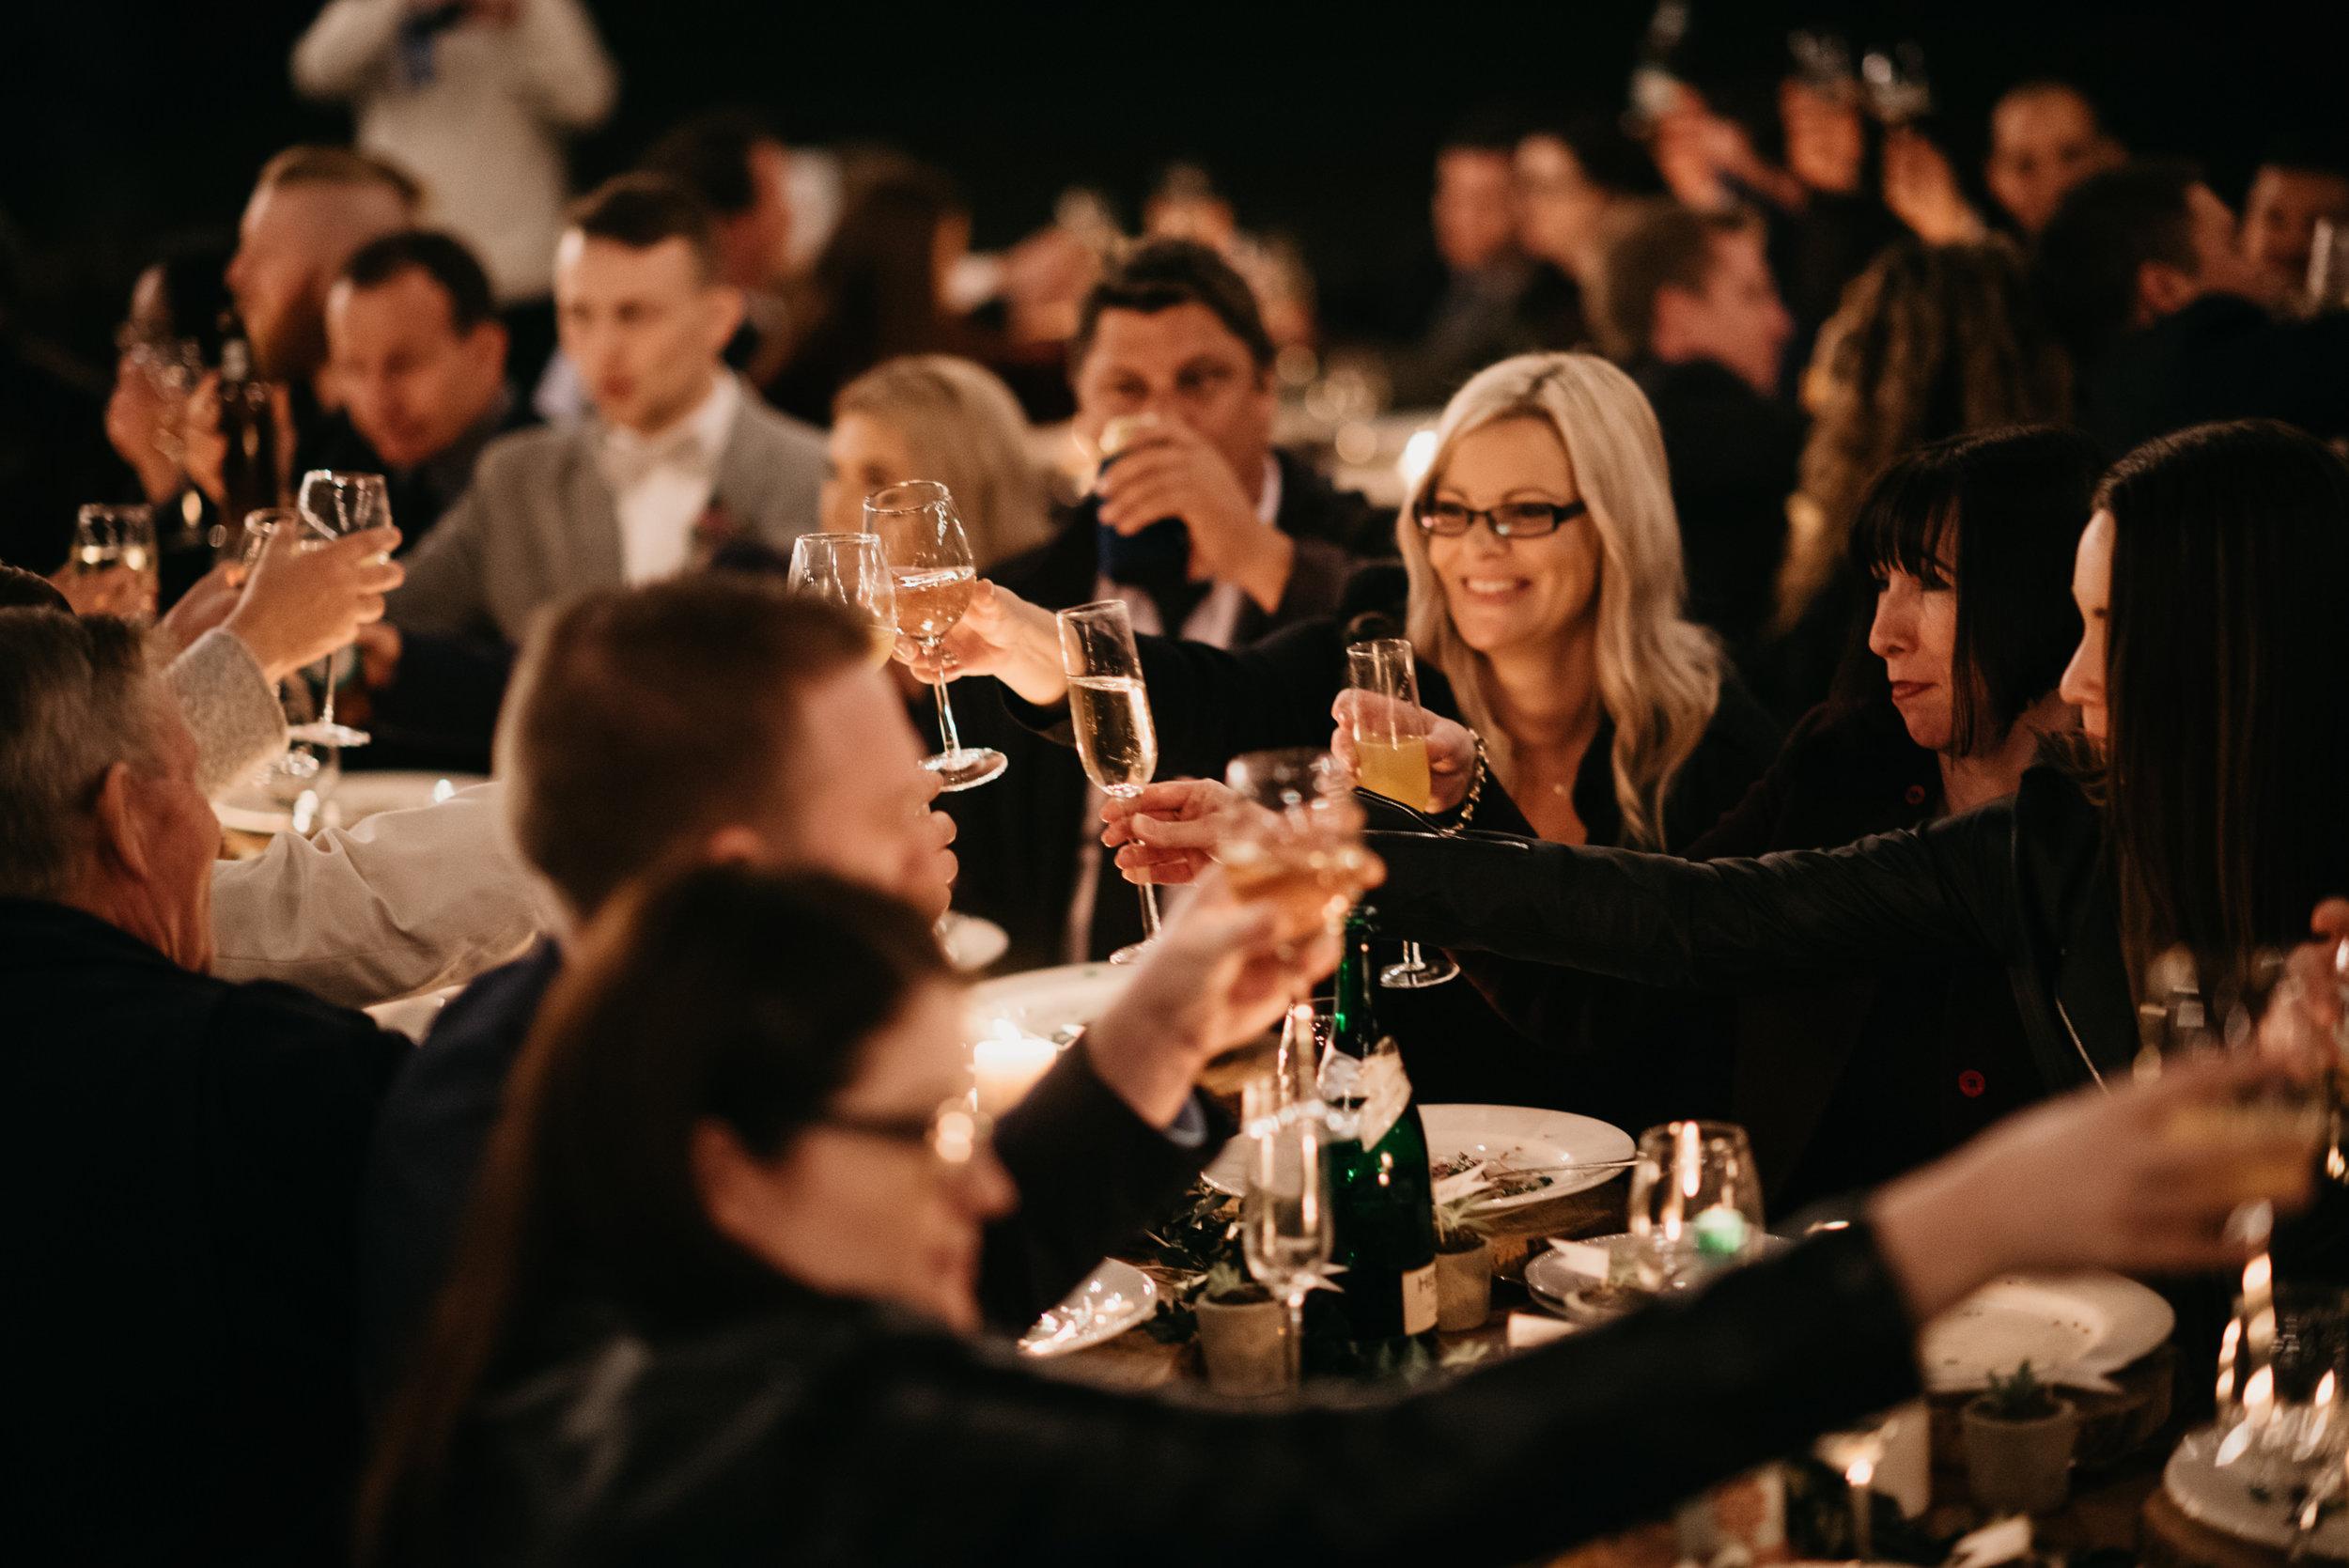 Bar & Catering - Something for Catering - http://somethingforcatering.com/Wine n Dine'm - https://winendinem.com/Journey Street Food - https://www.journeystreetfood.com/The Vintage Bondwood Bar - http://www.thevintagebondwoodbar.com.au/